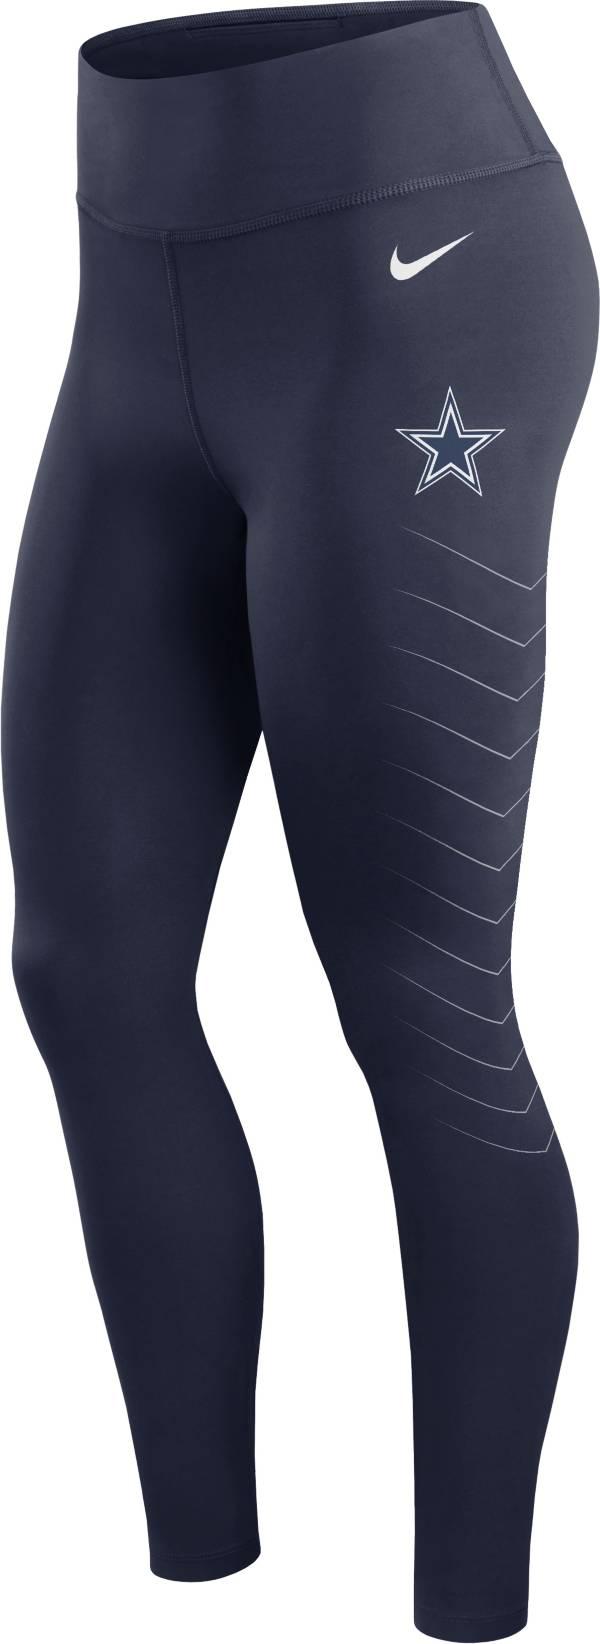 Nike Women's Dallas Cowboys Dri-FIT Navy Performance Leggings product image